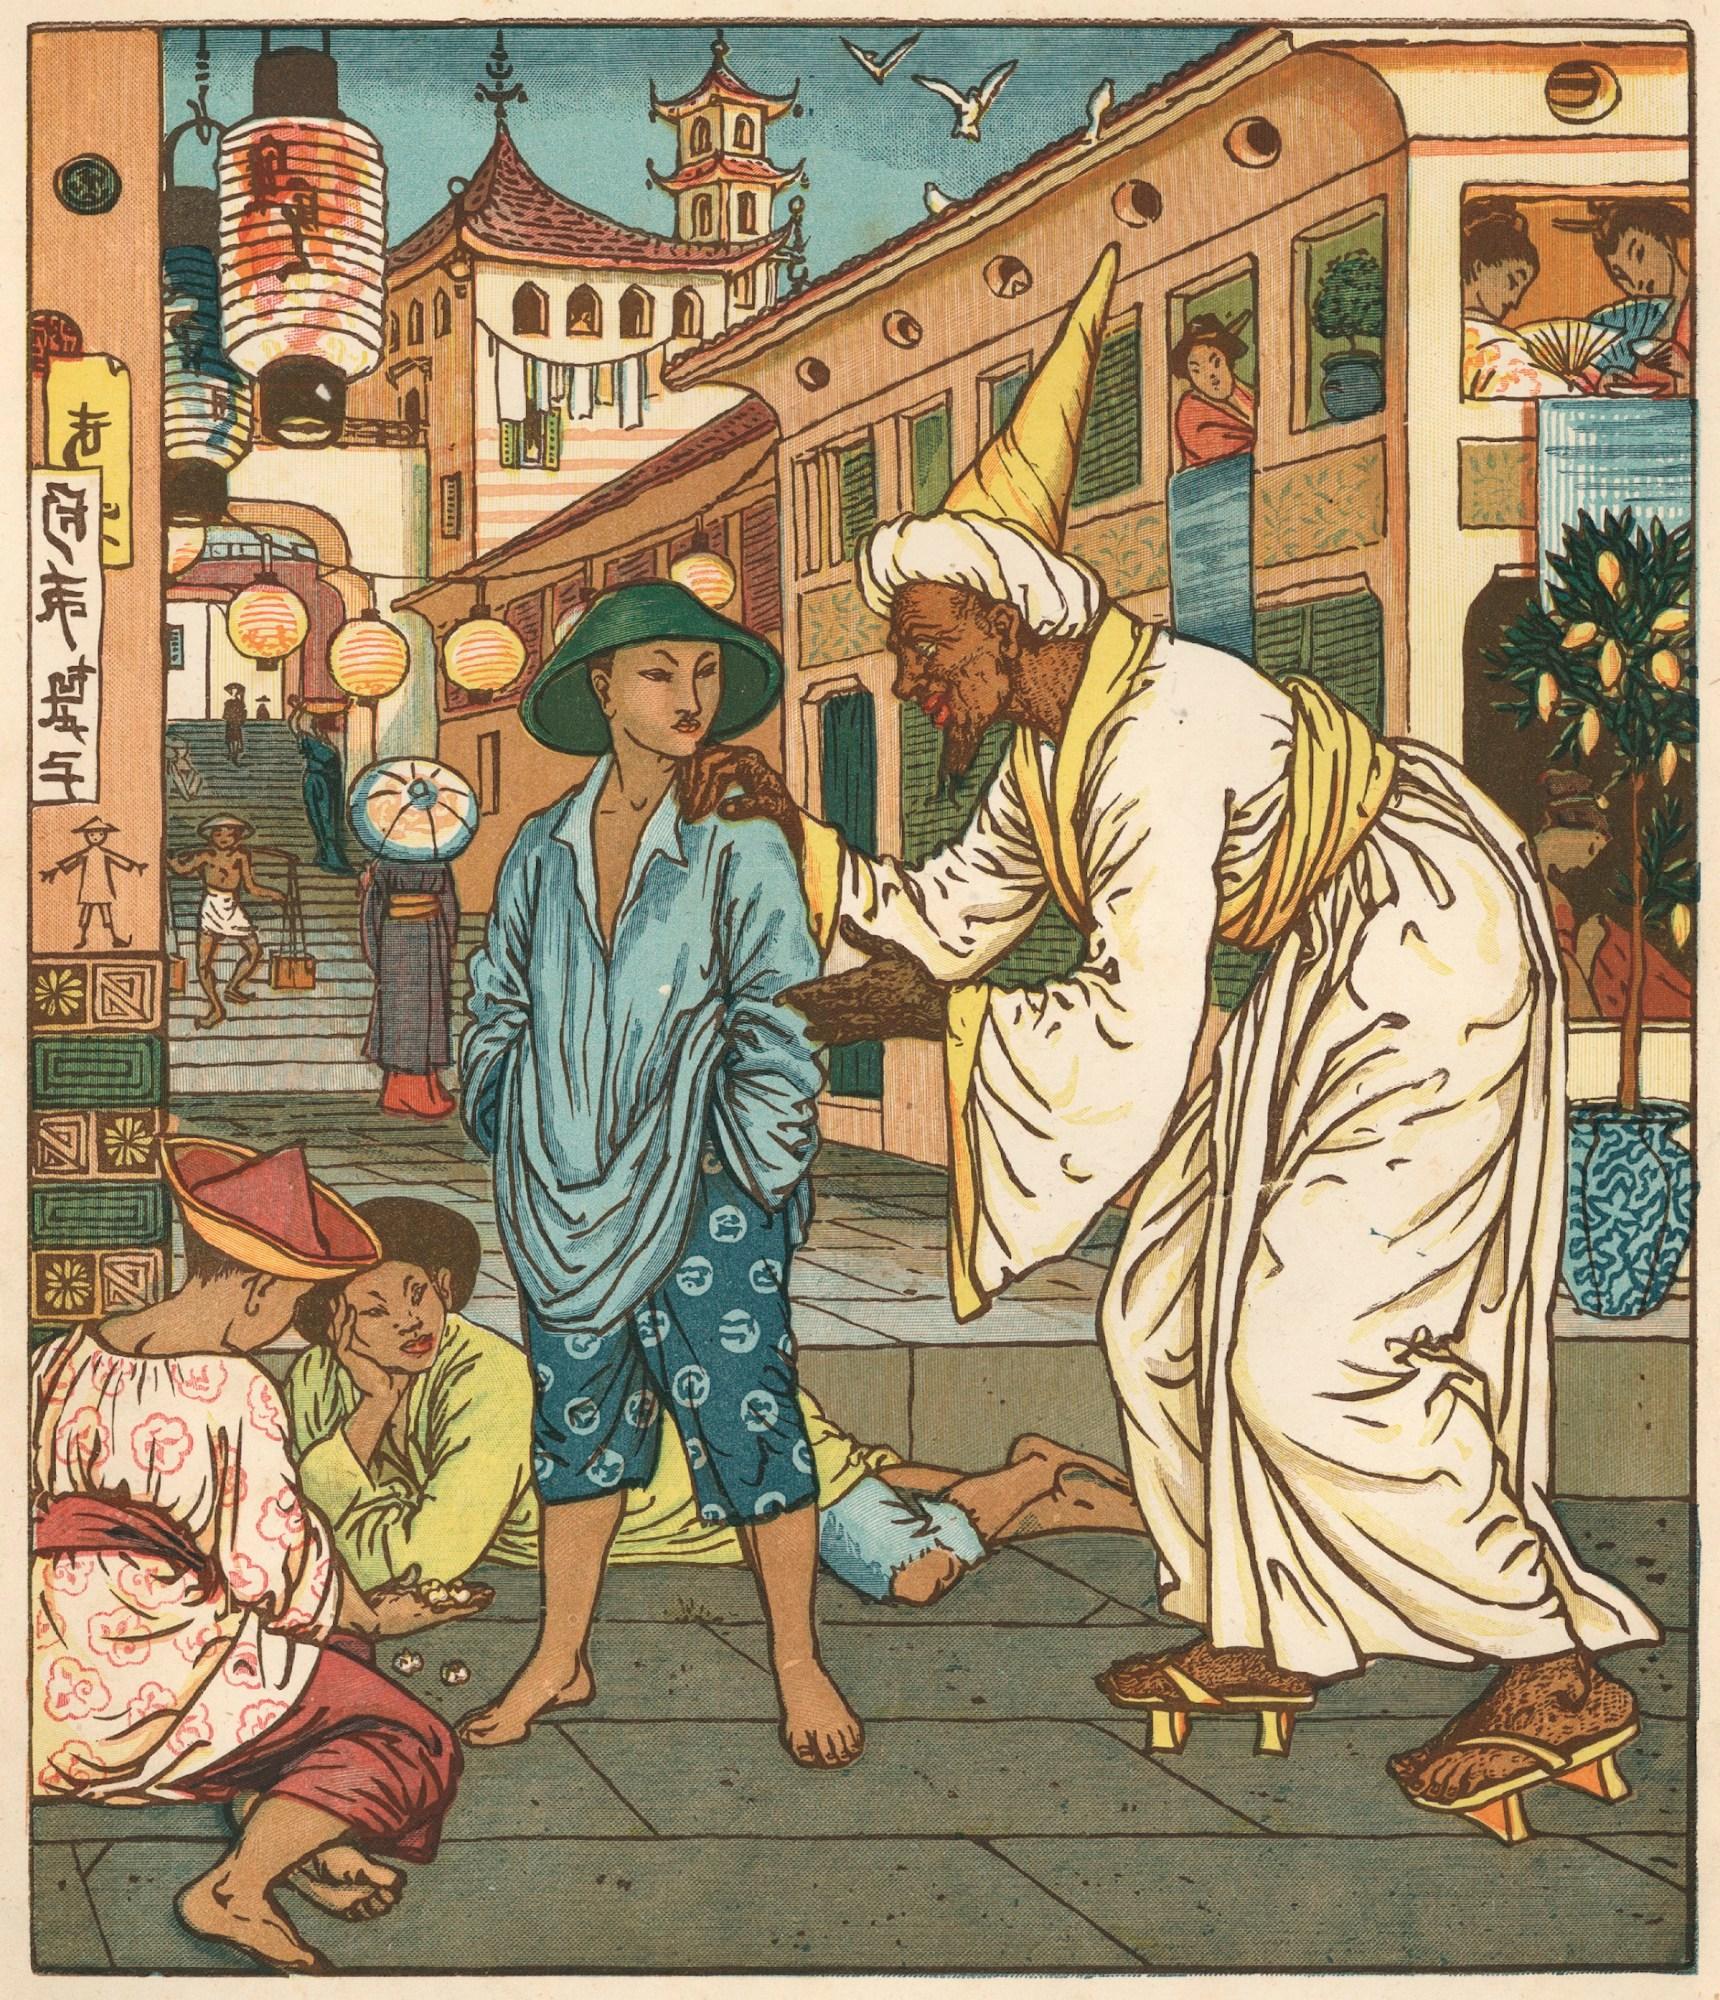 https://upload.wikimedia.org/wikipedia/commons/c/c3/Aladdin%27s_Picture_Book,_Arabian_Nights,_1878_%28illustration%29.jpg